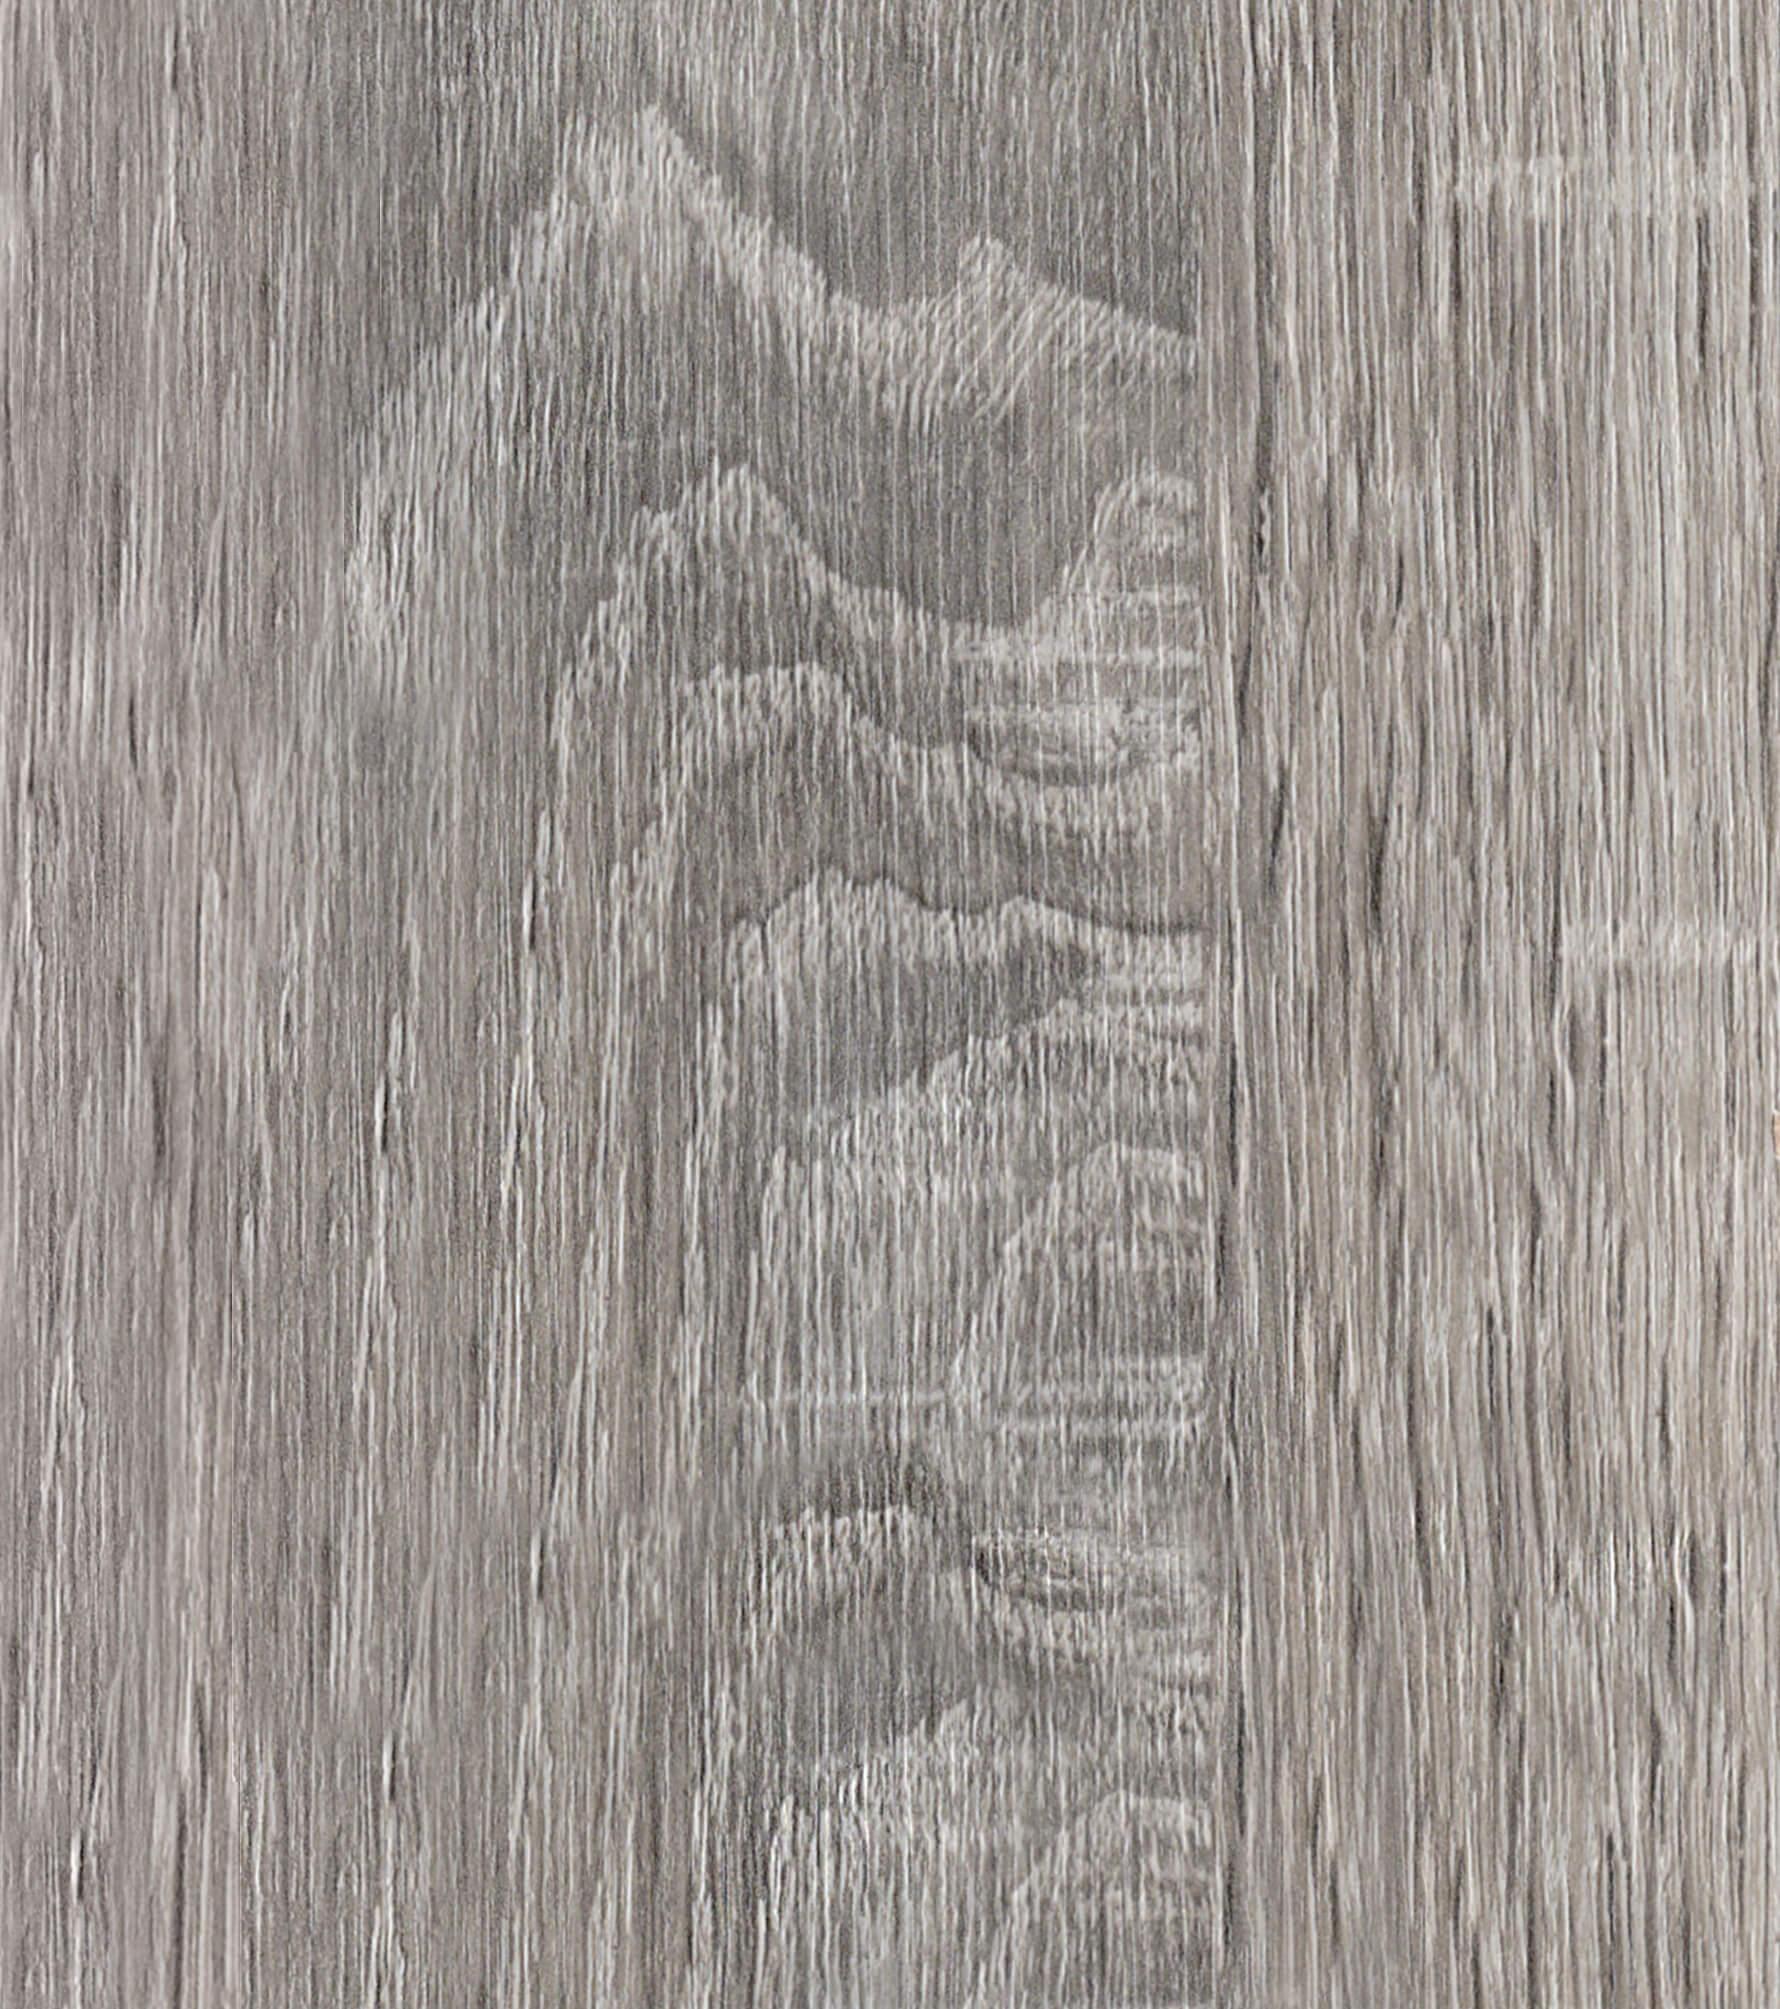 Drifted Oak Textured TFL